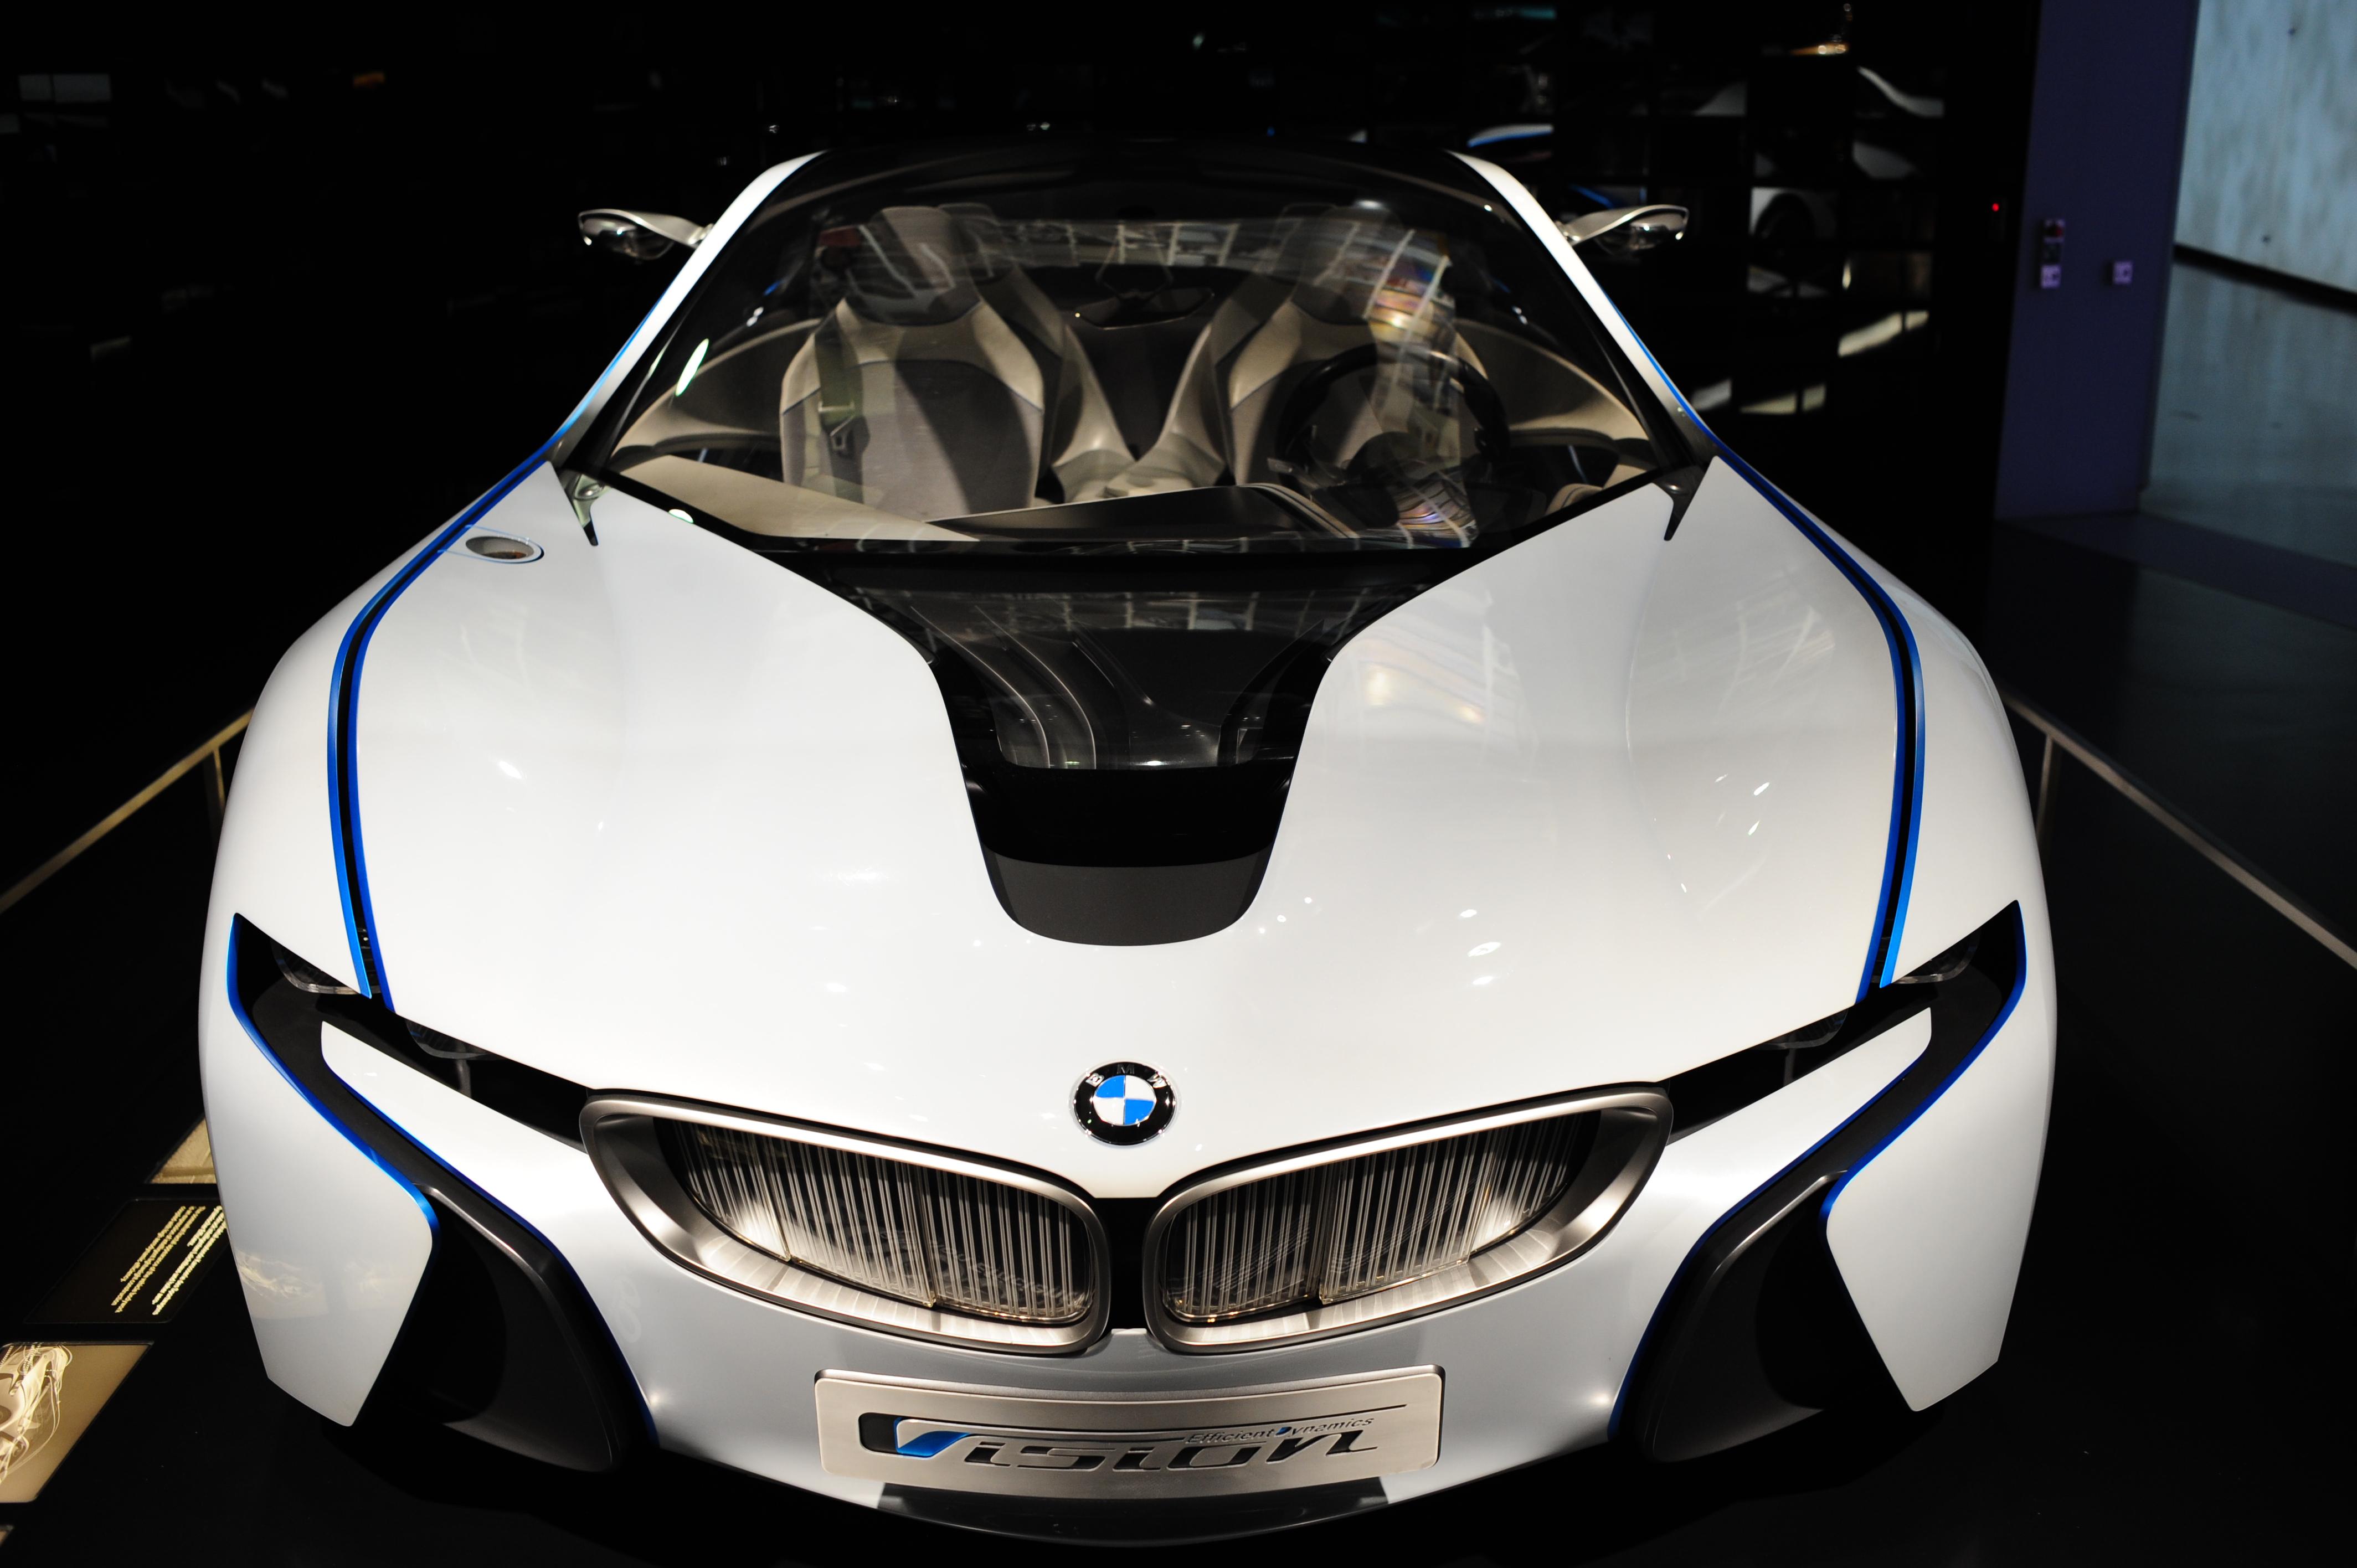 Concept car in BMW museum